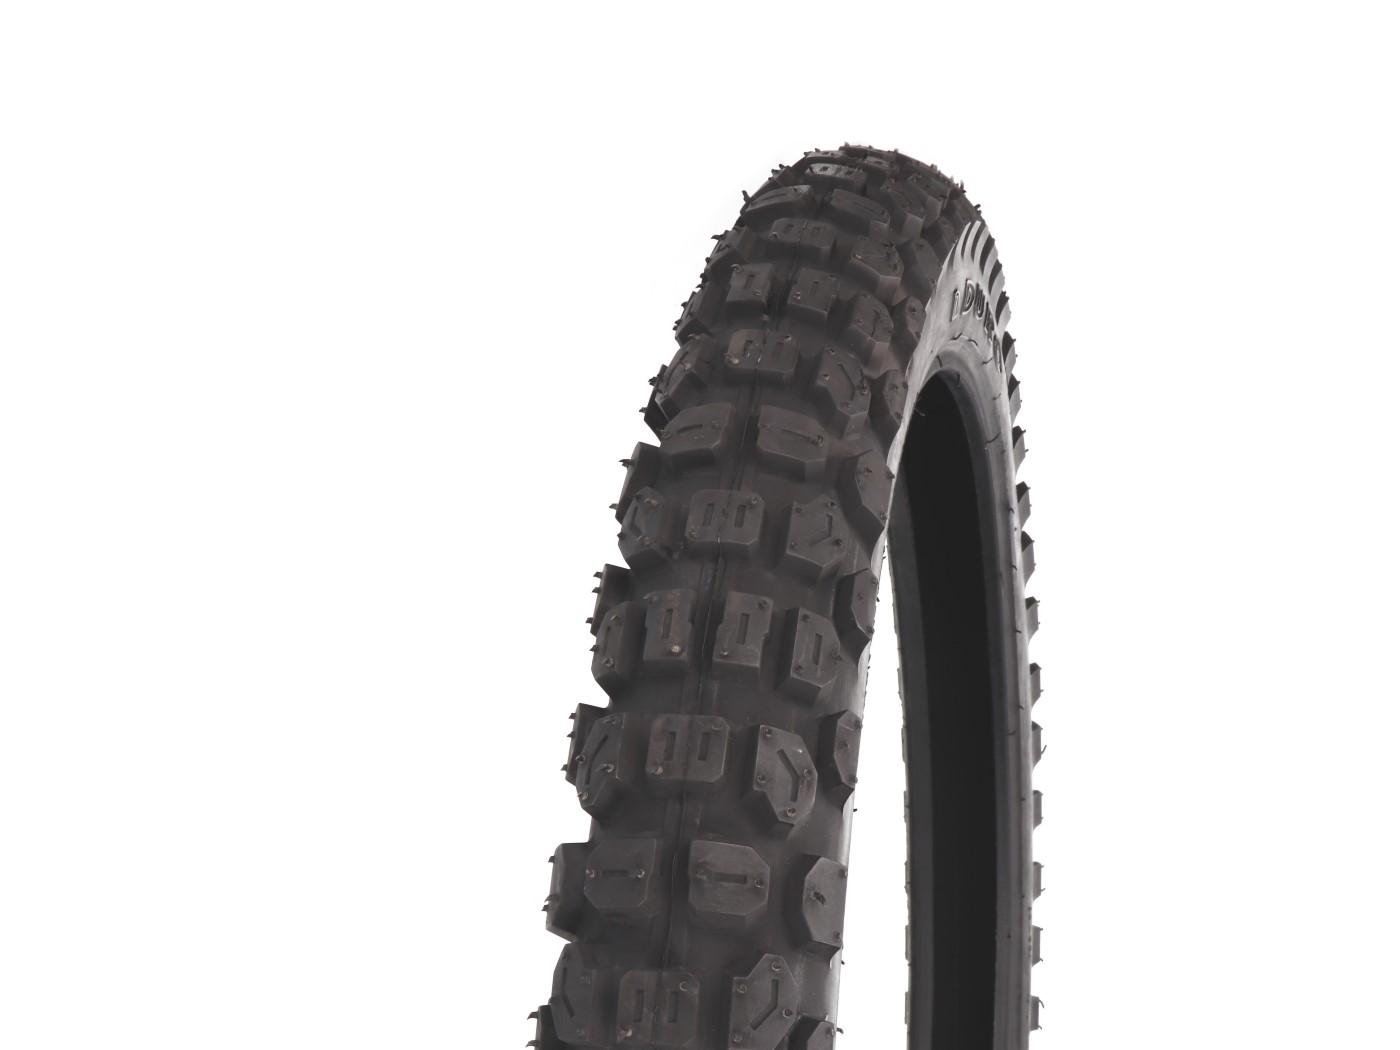 Scooter tire Duro HF333 2.75-21 45P TT Hyosung RX Enduro